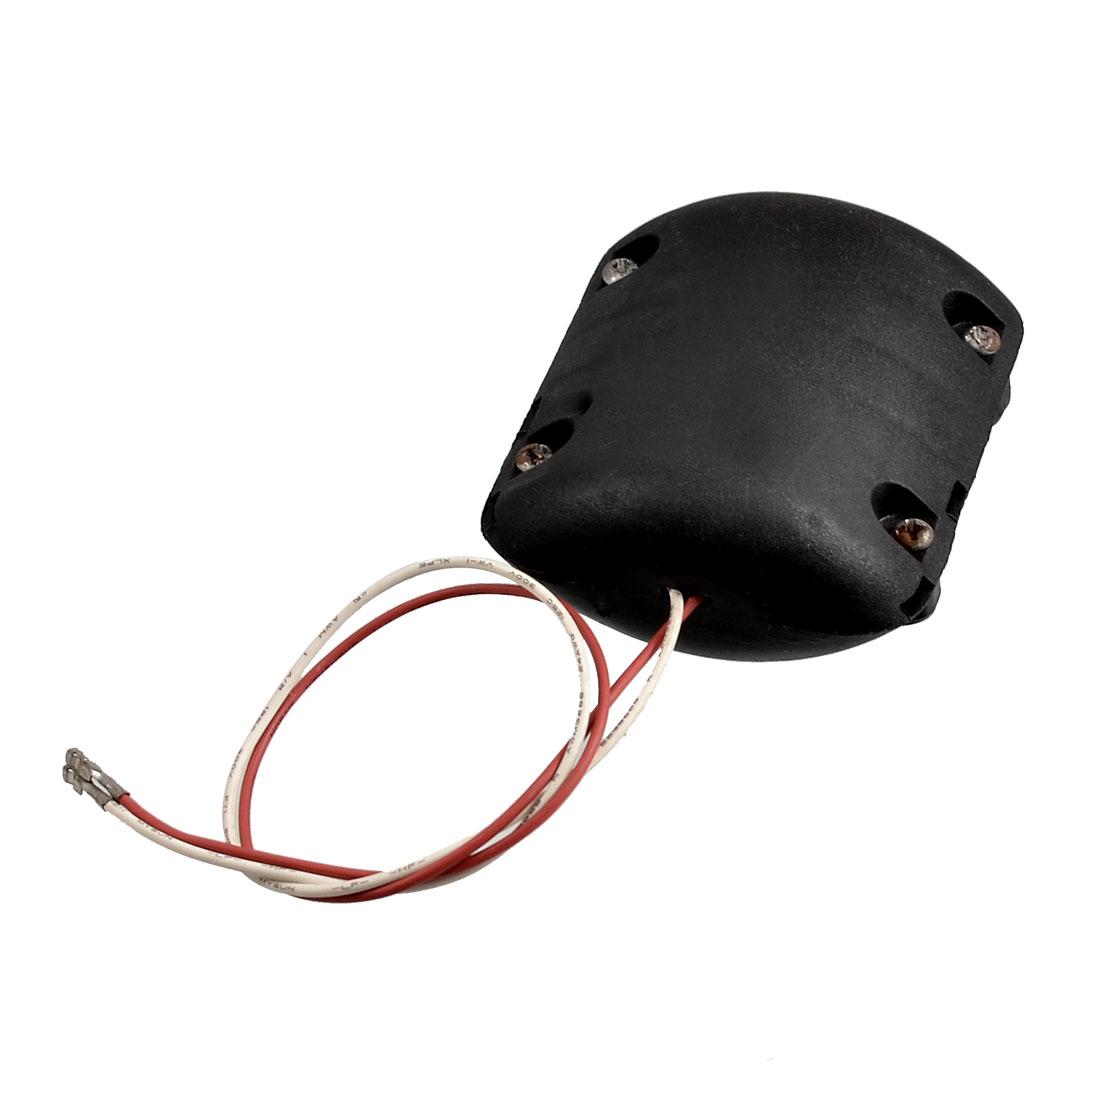 Black Shell DC 12V 0.25A 4100RPM Vibration Motor for Massage Cushion